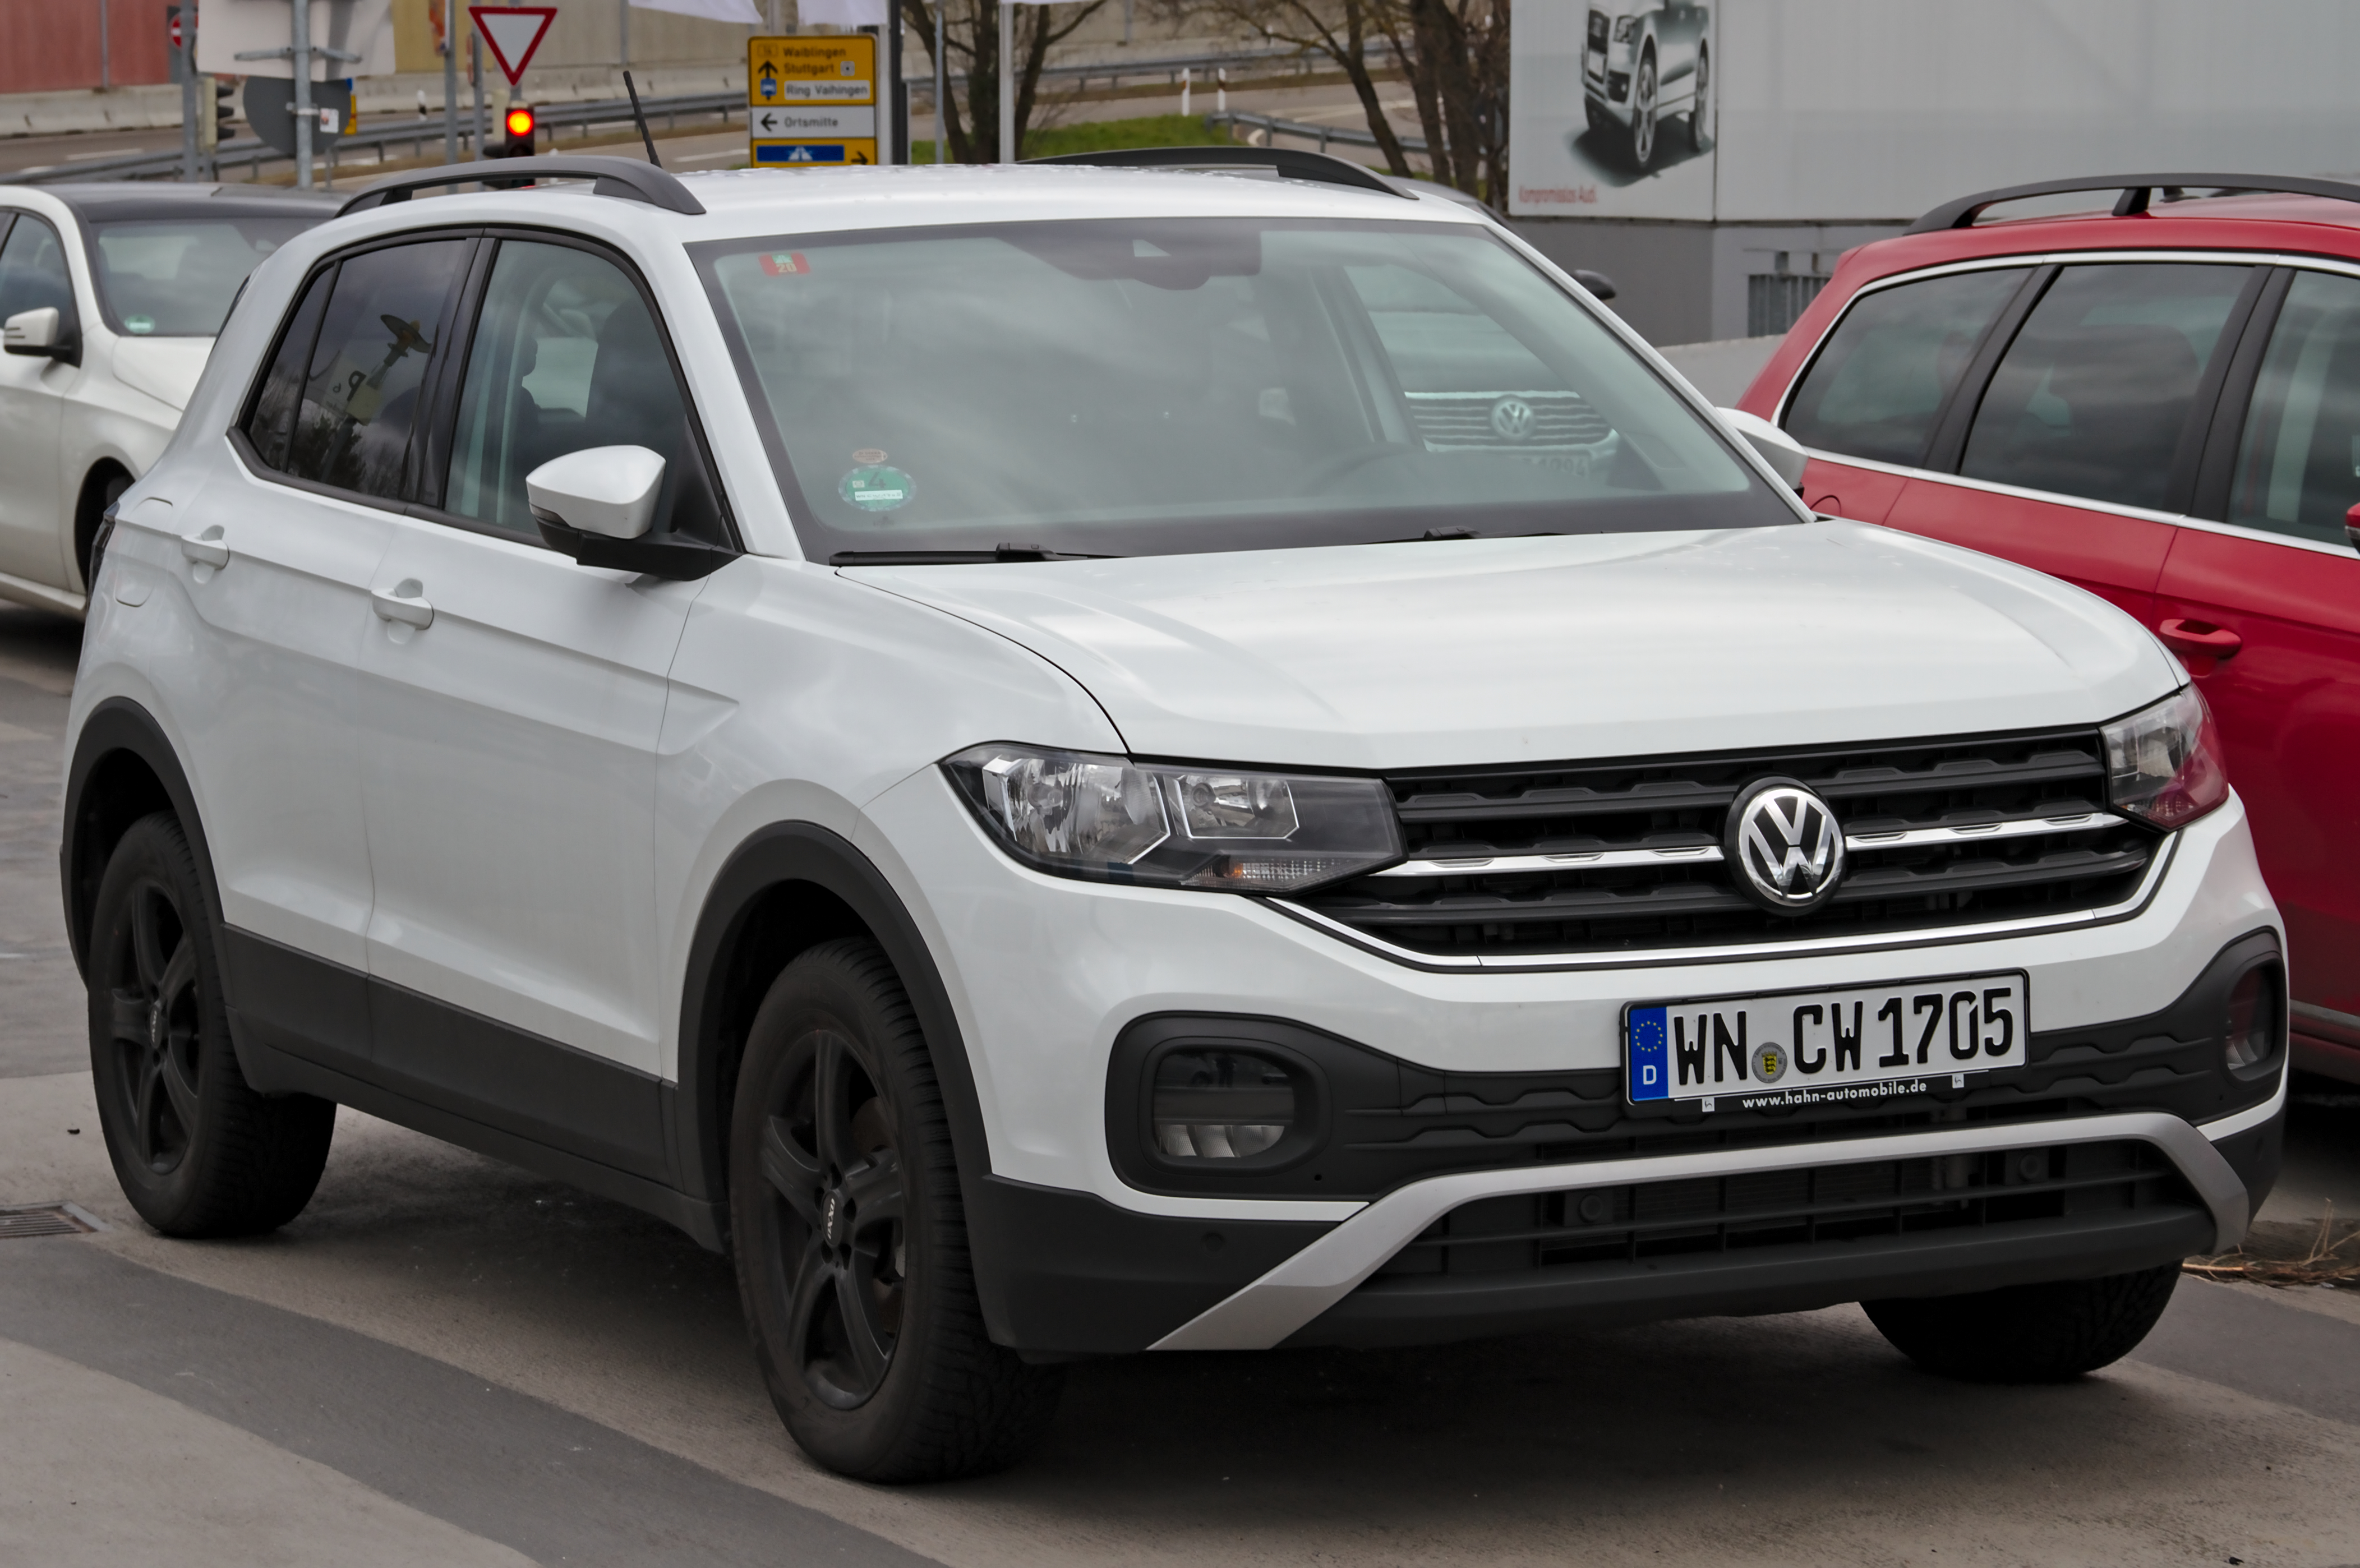 File:Volkswagen T-Cross IMG 0352.jpg - Wikimedia Commons